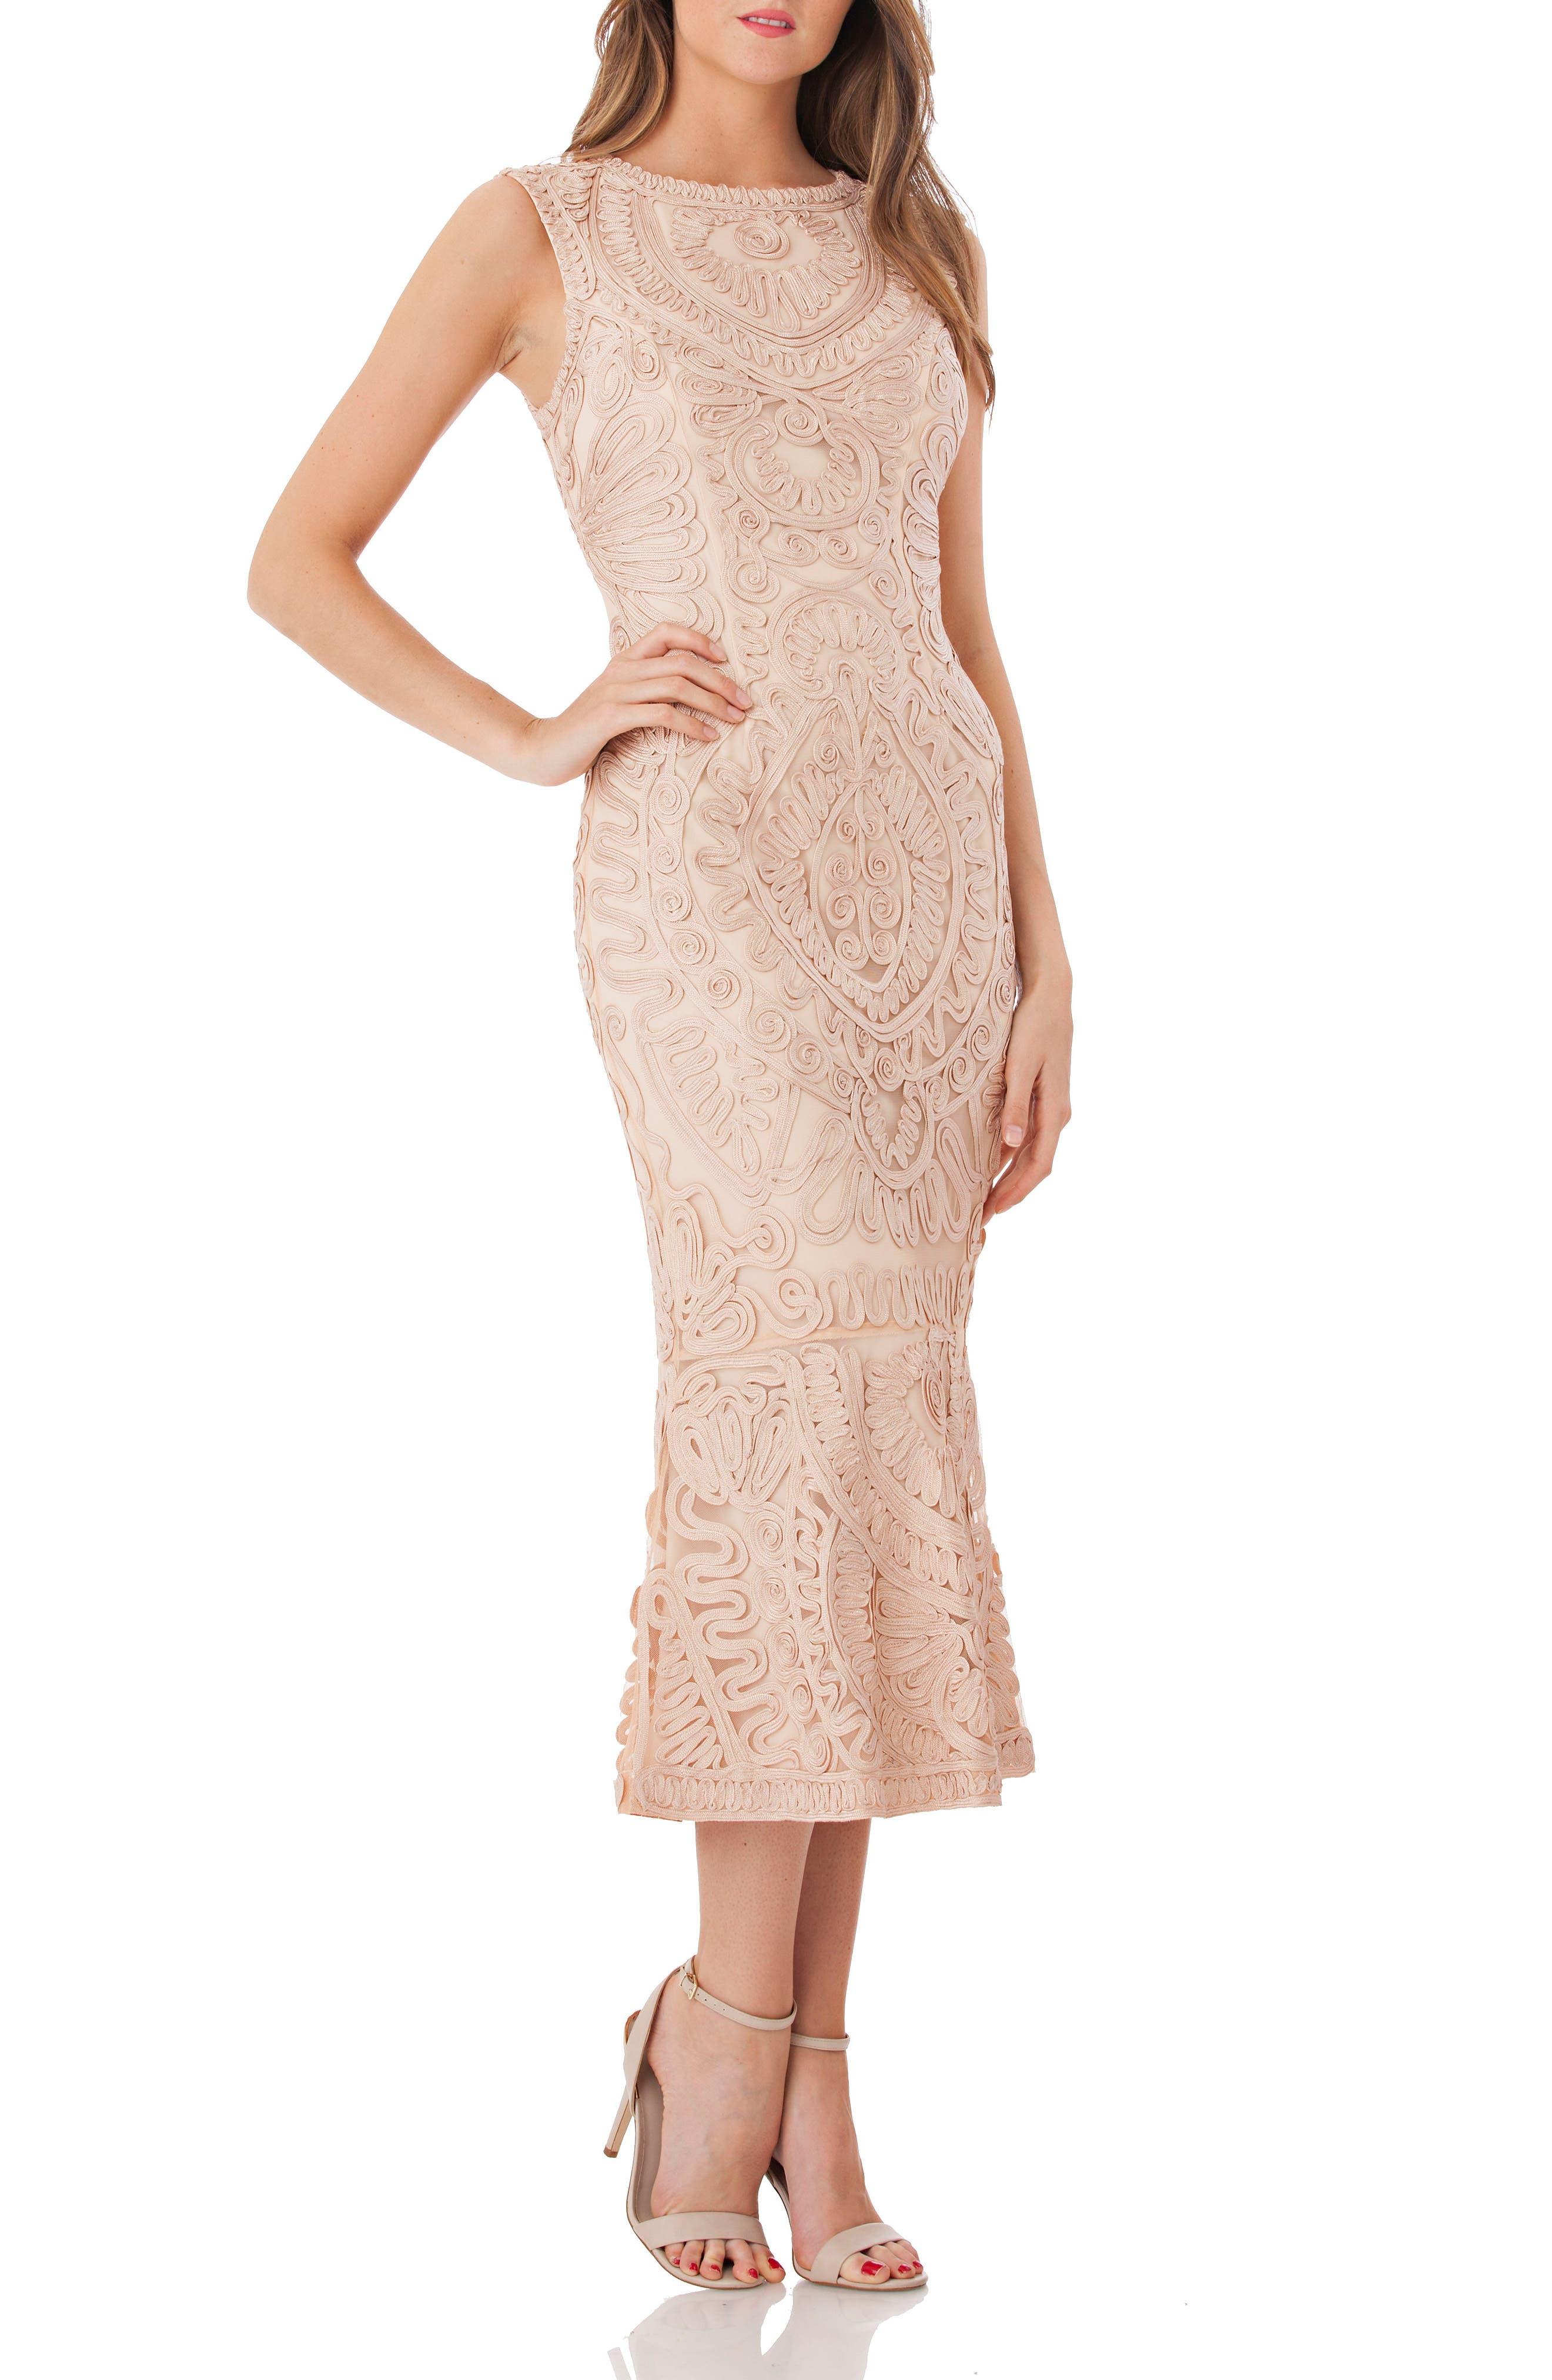 Alternate Image 1 Selected - JS Collections Soutache Mesh Dress (Regular & Petite)